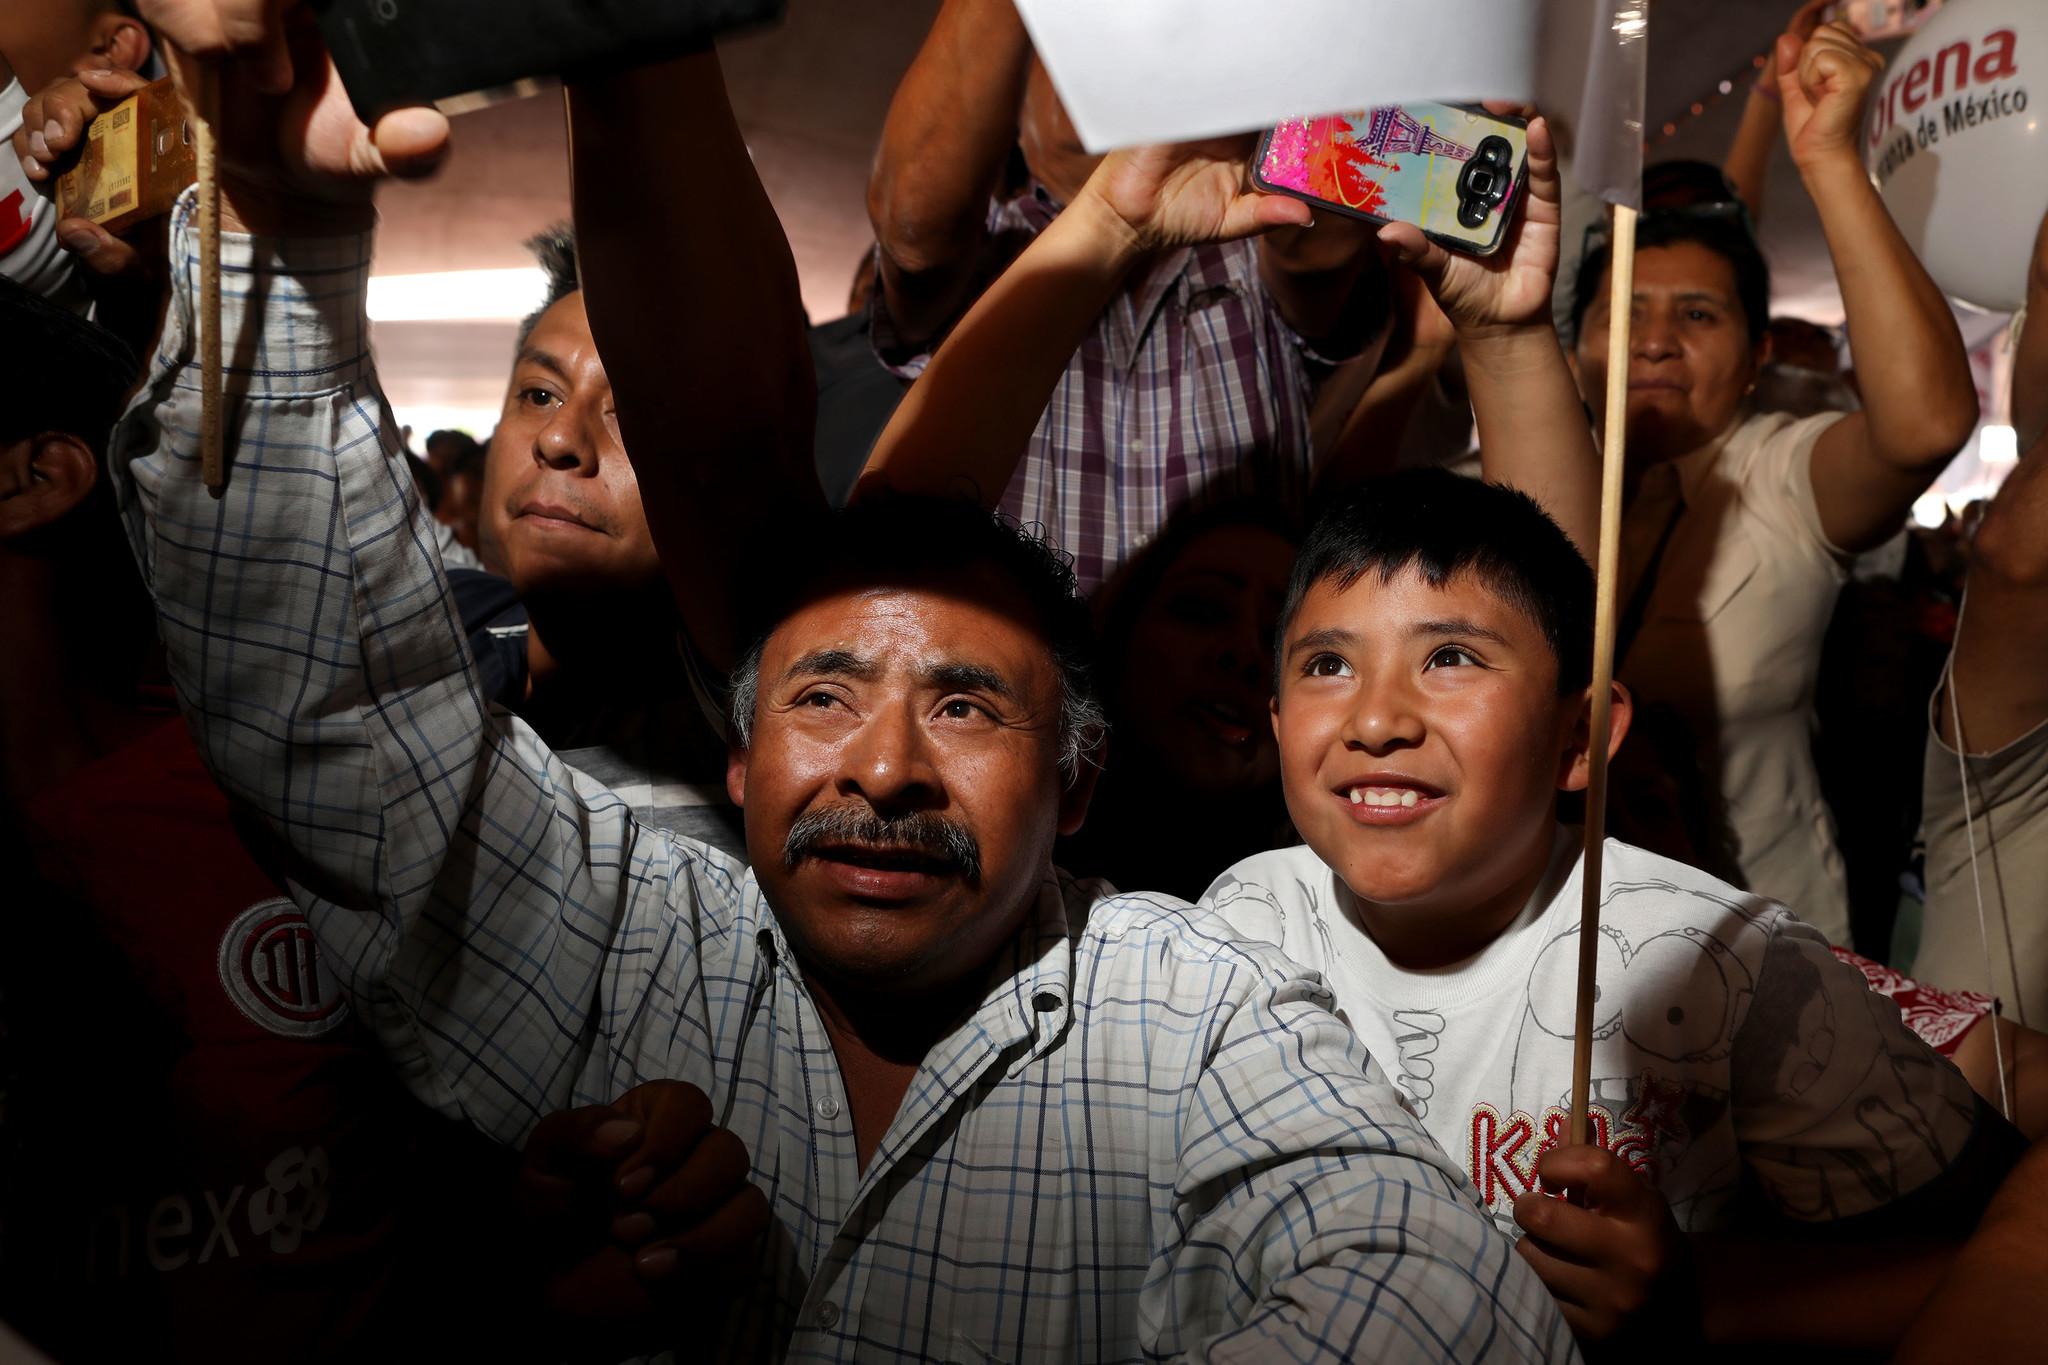 Lopez Obrador supporters